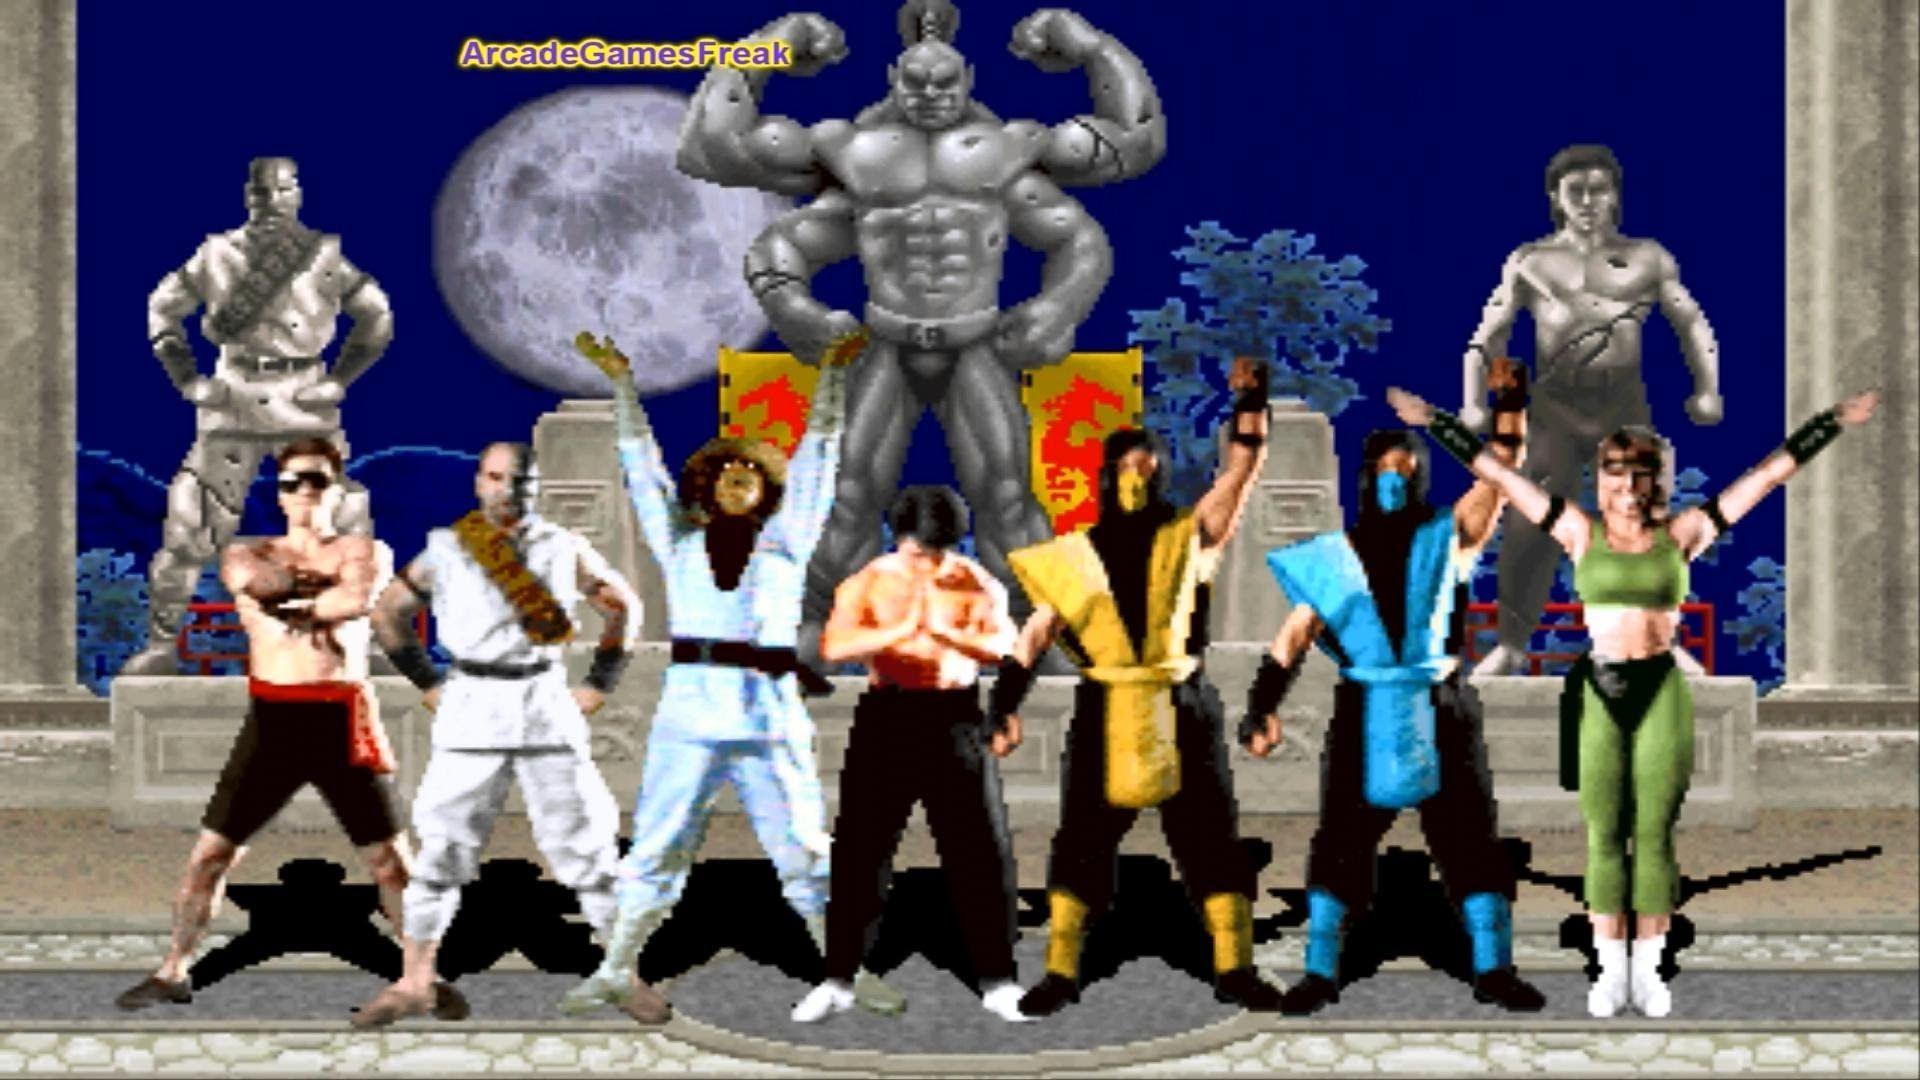 Mortal Kombat 1 Intro All Characters Prologues and Endings | Mortal kombat, Mortal  kombat characters, Mortal kombat 1